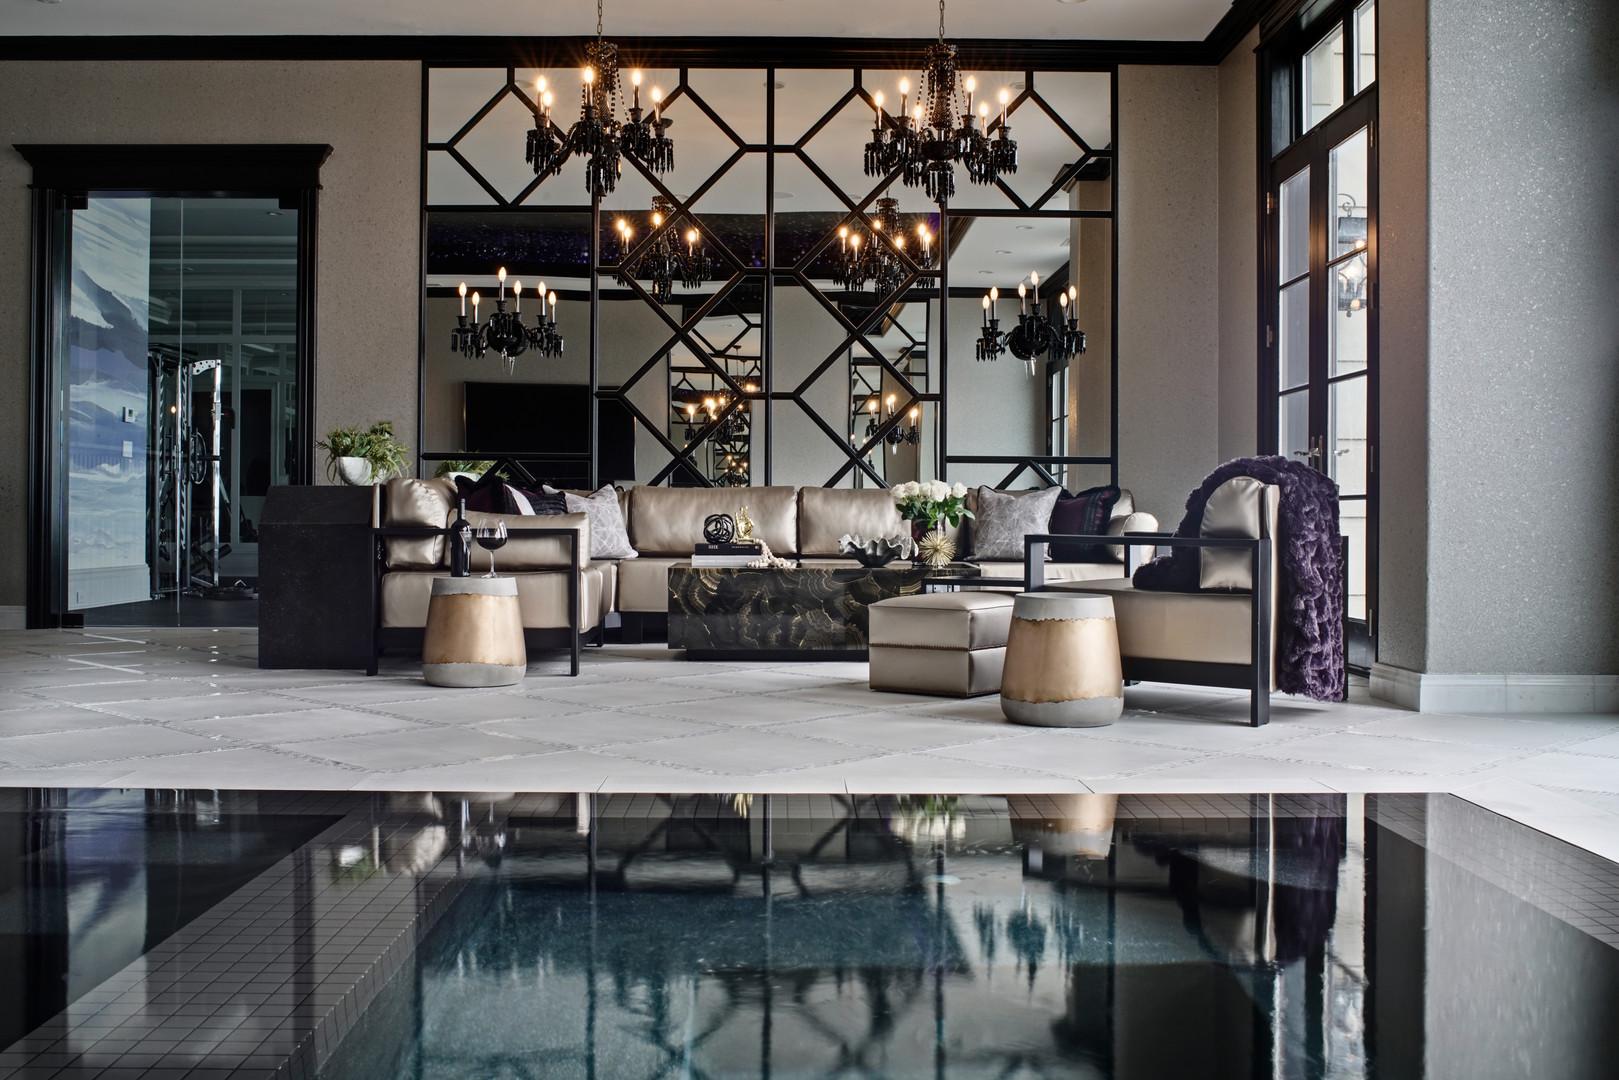 Pool House Lounge